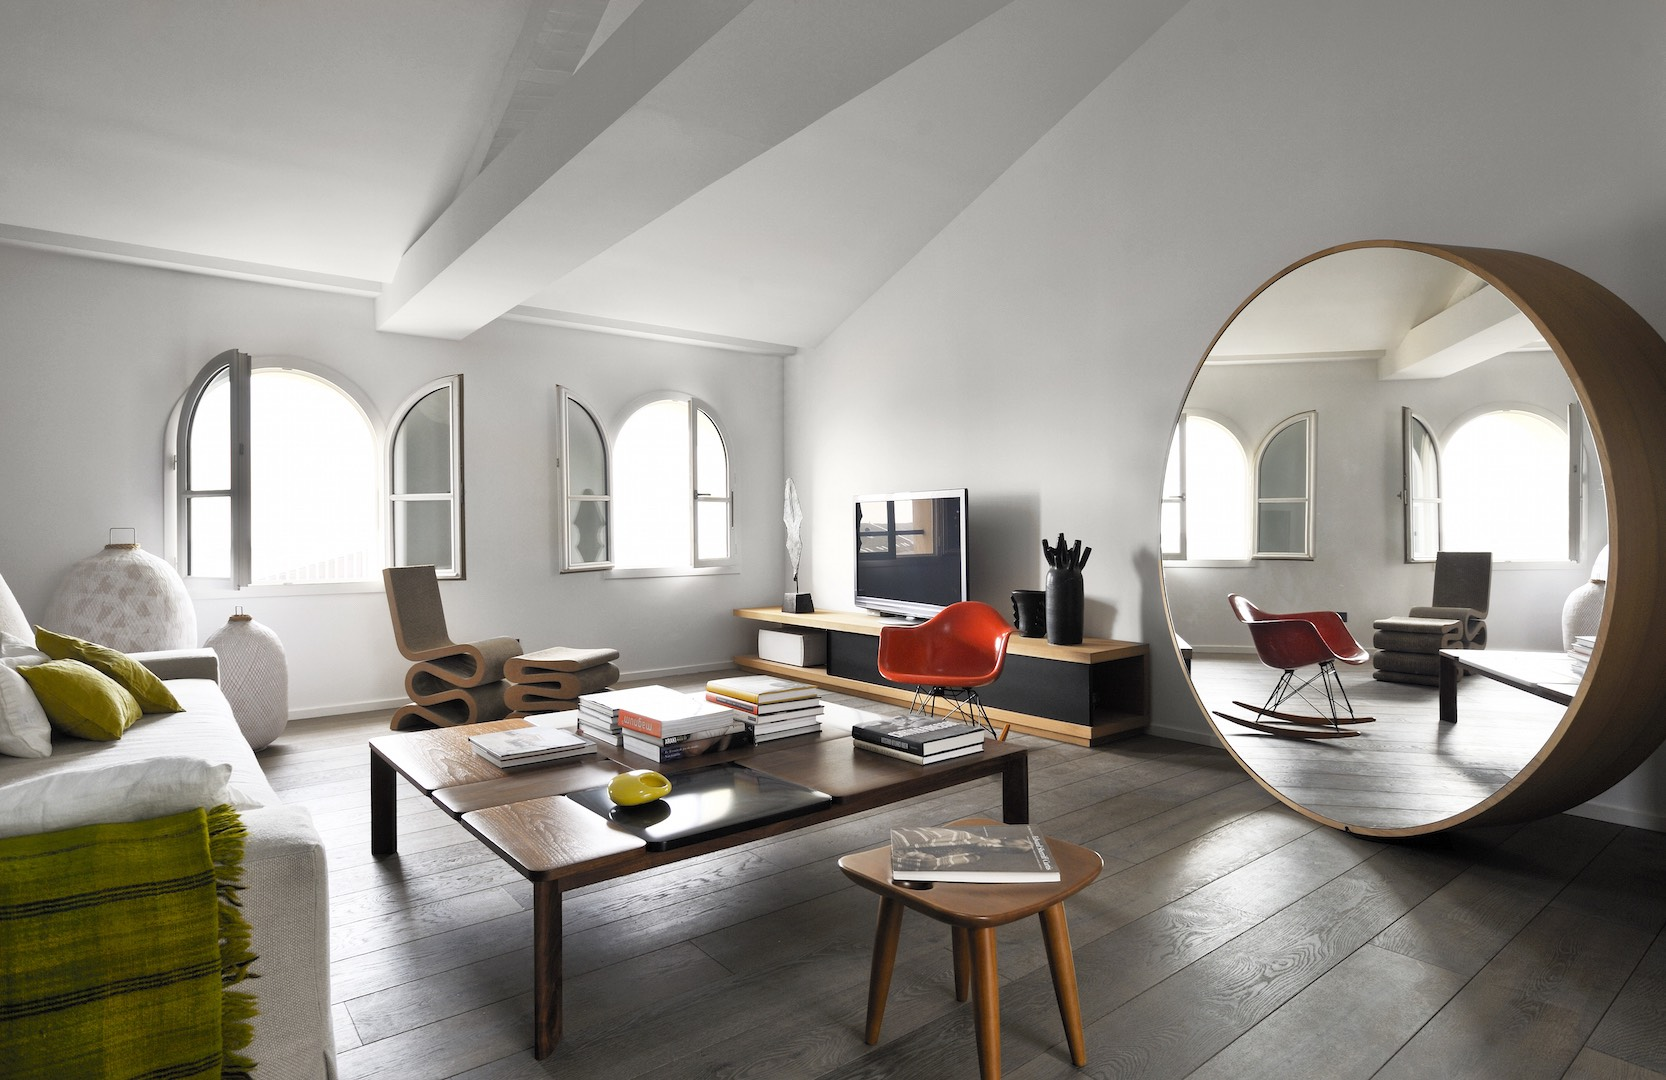 The Joliette apartment in Marseille